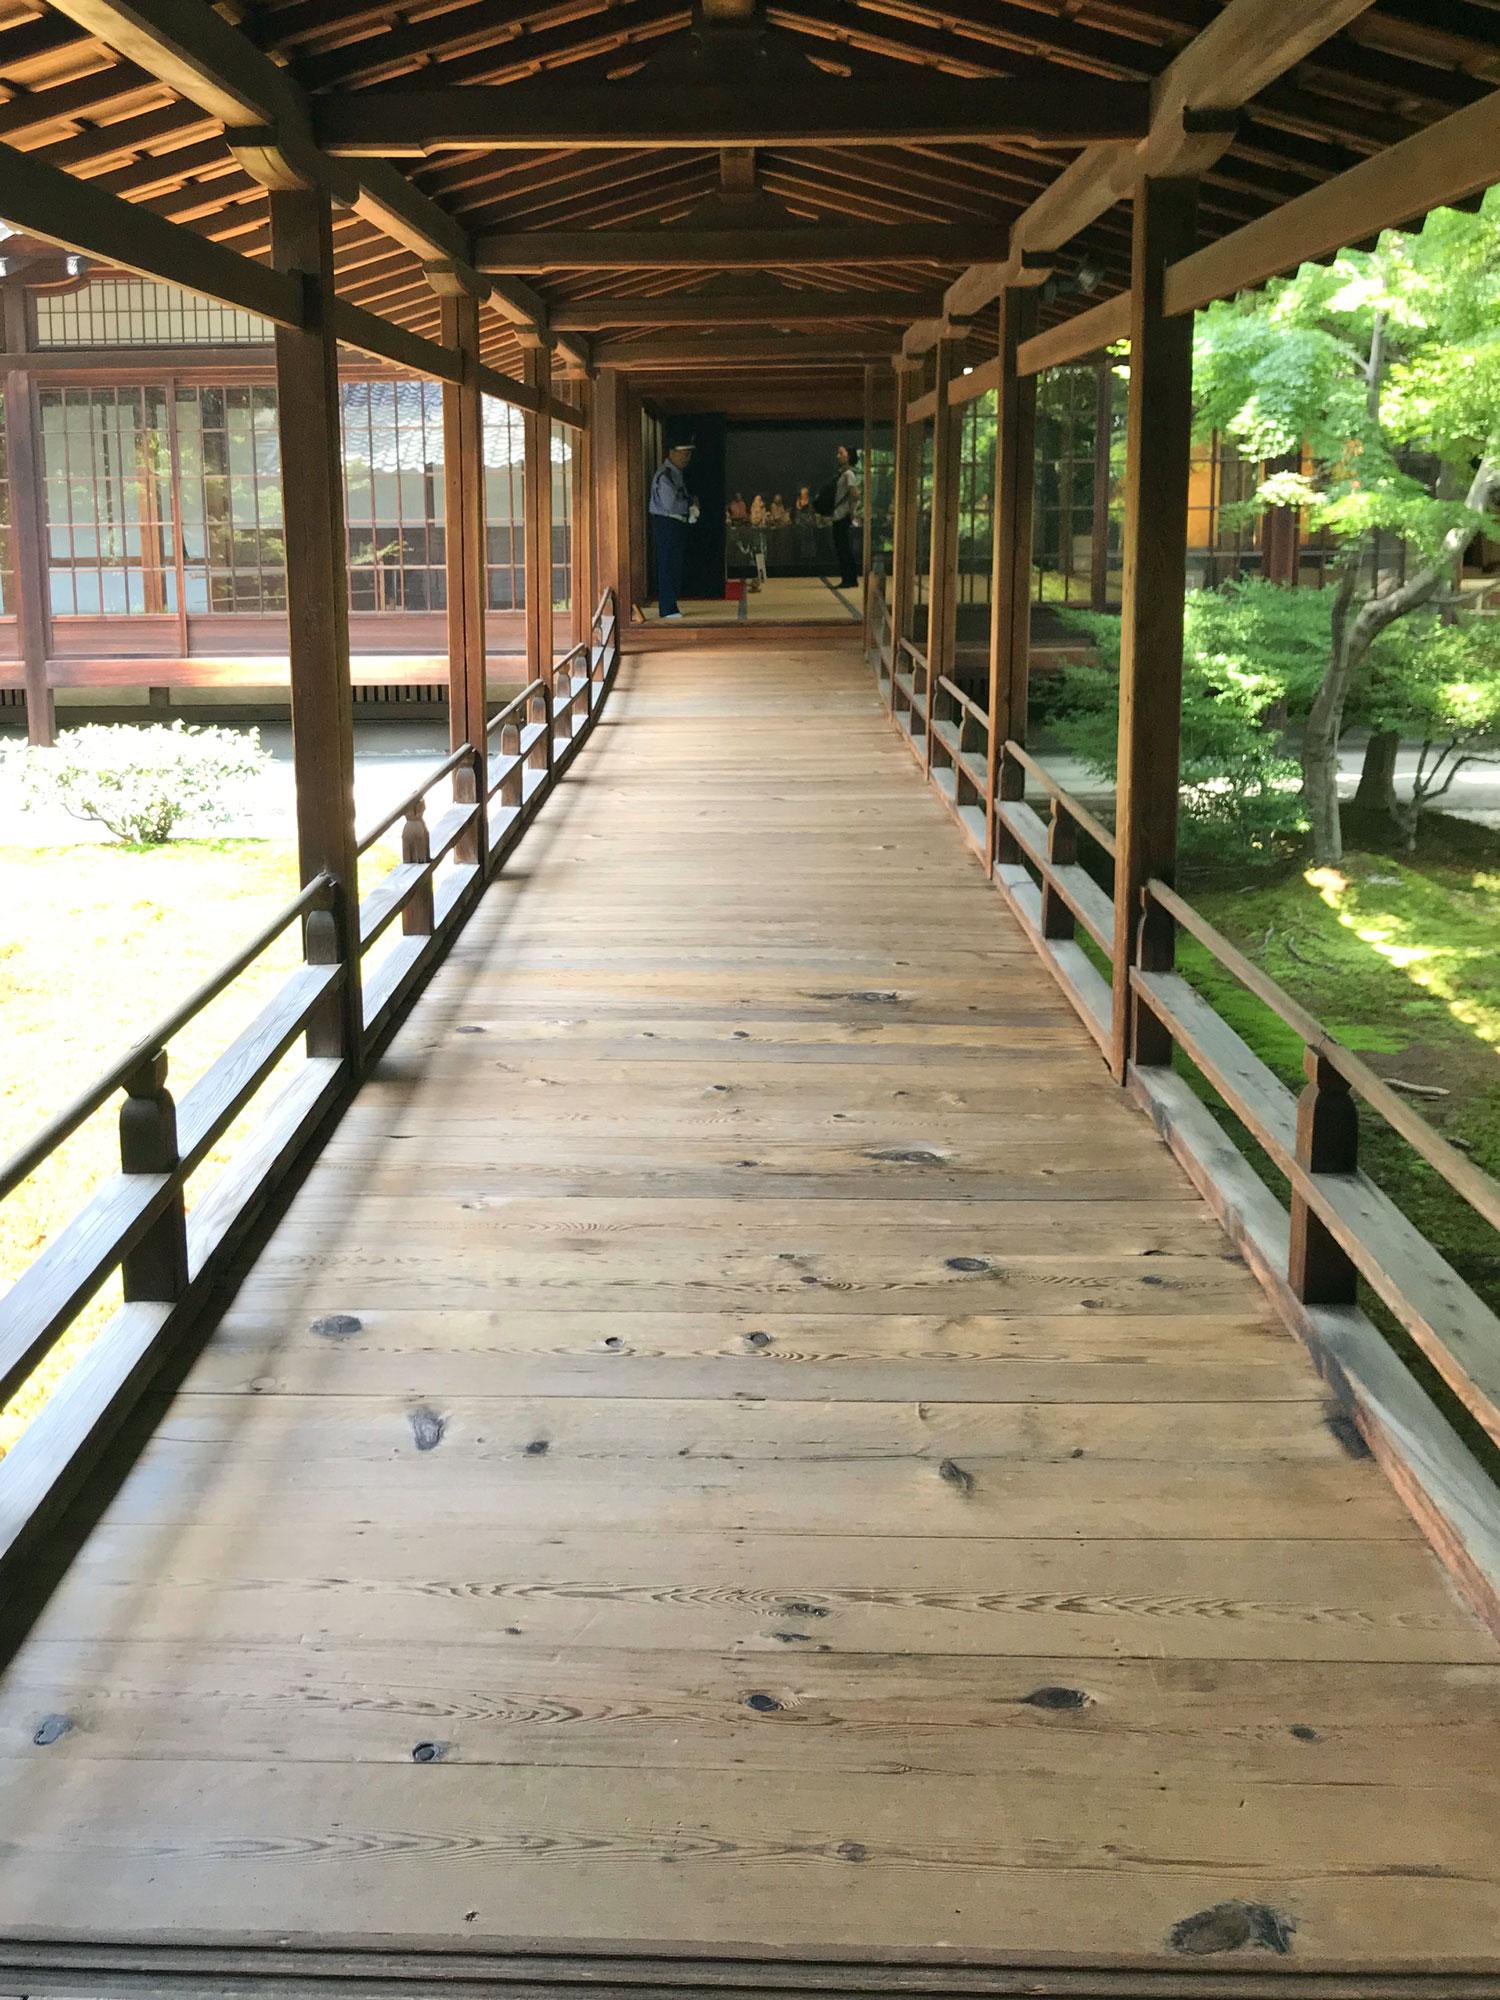 Kennin-ji-ZEN-Tempel-06b.jpg